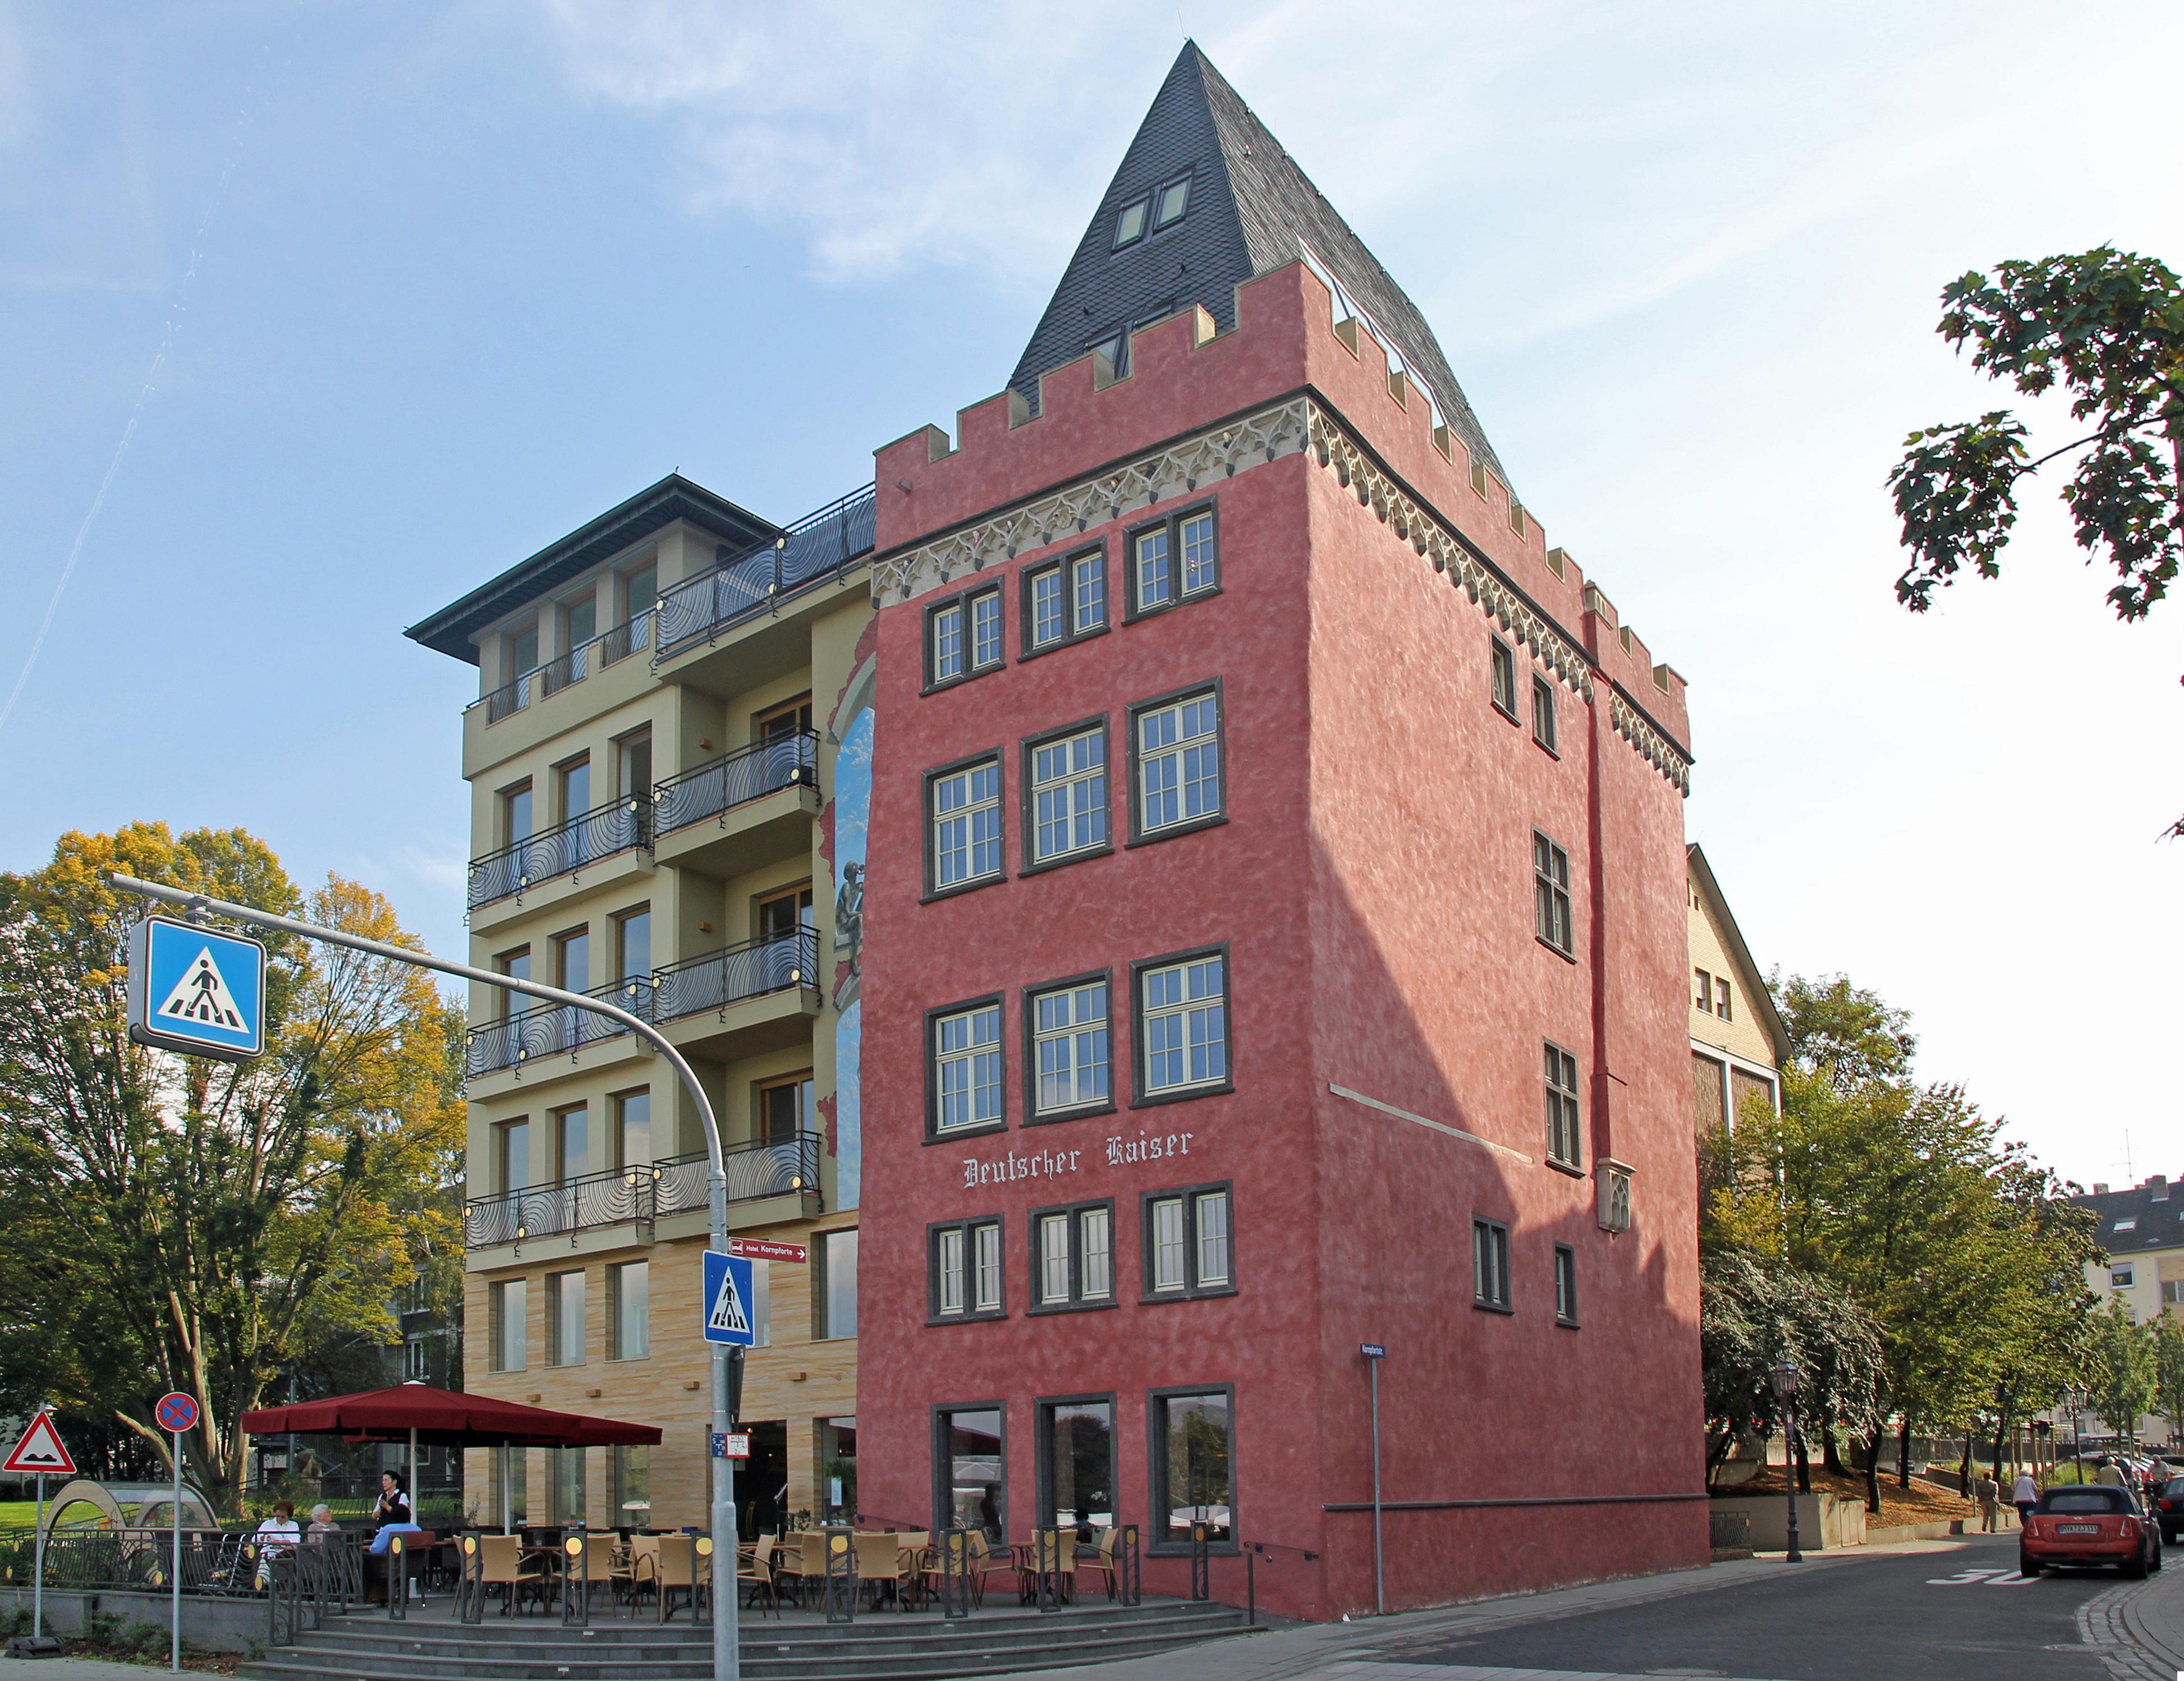 Deutscher_Kaiser_01_Koblenz_2014.jpg